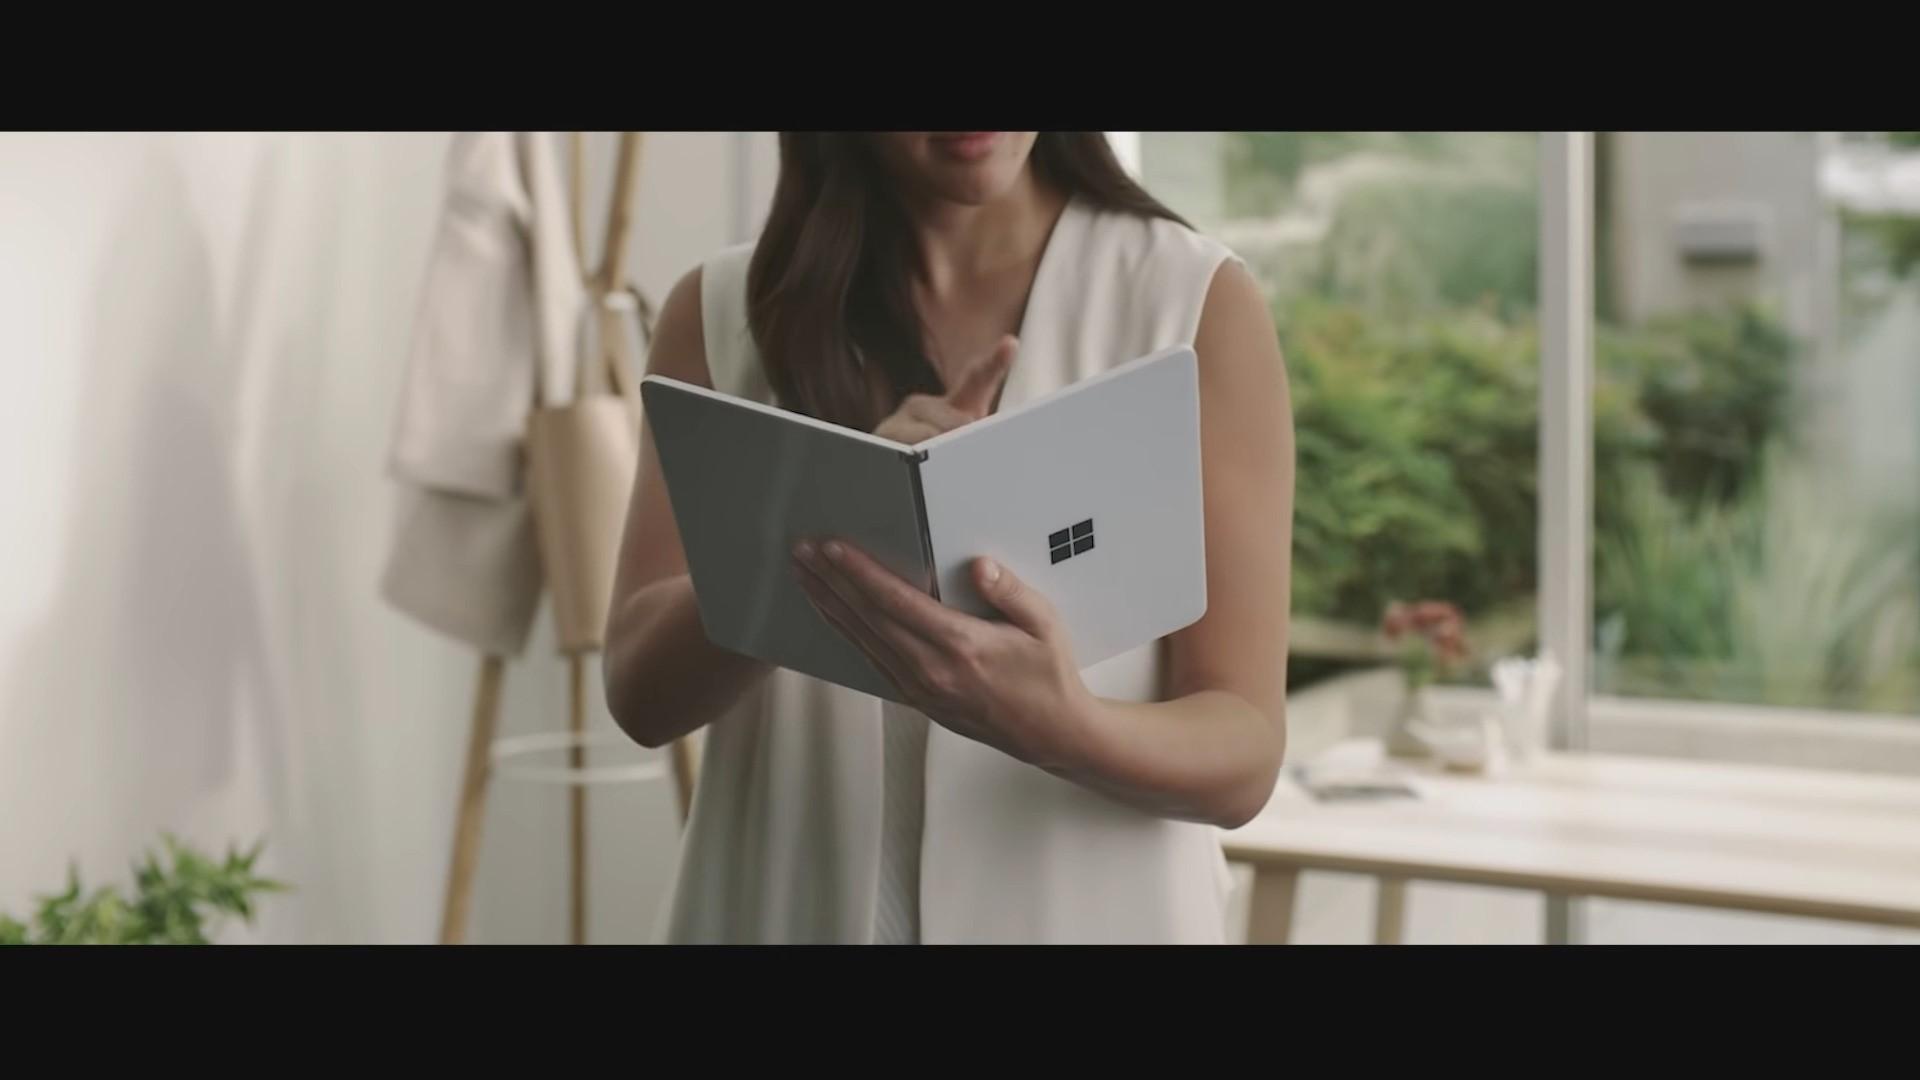 Microsoft Surface Neo,Windows 10X,Tablet,Mit Telefonie,Mit Telefonfunktion,ohne Telefonie,ohne...jpg